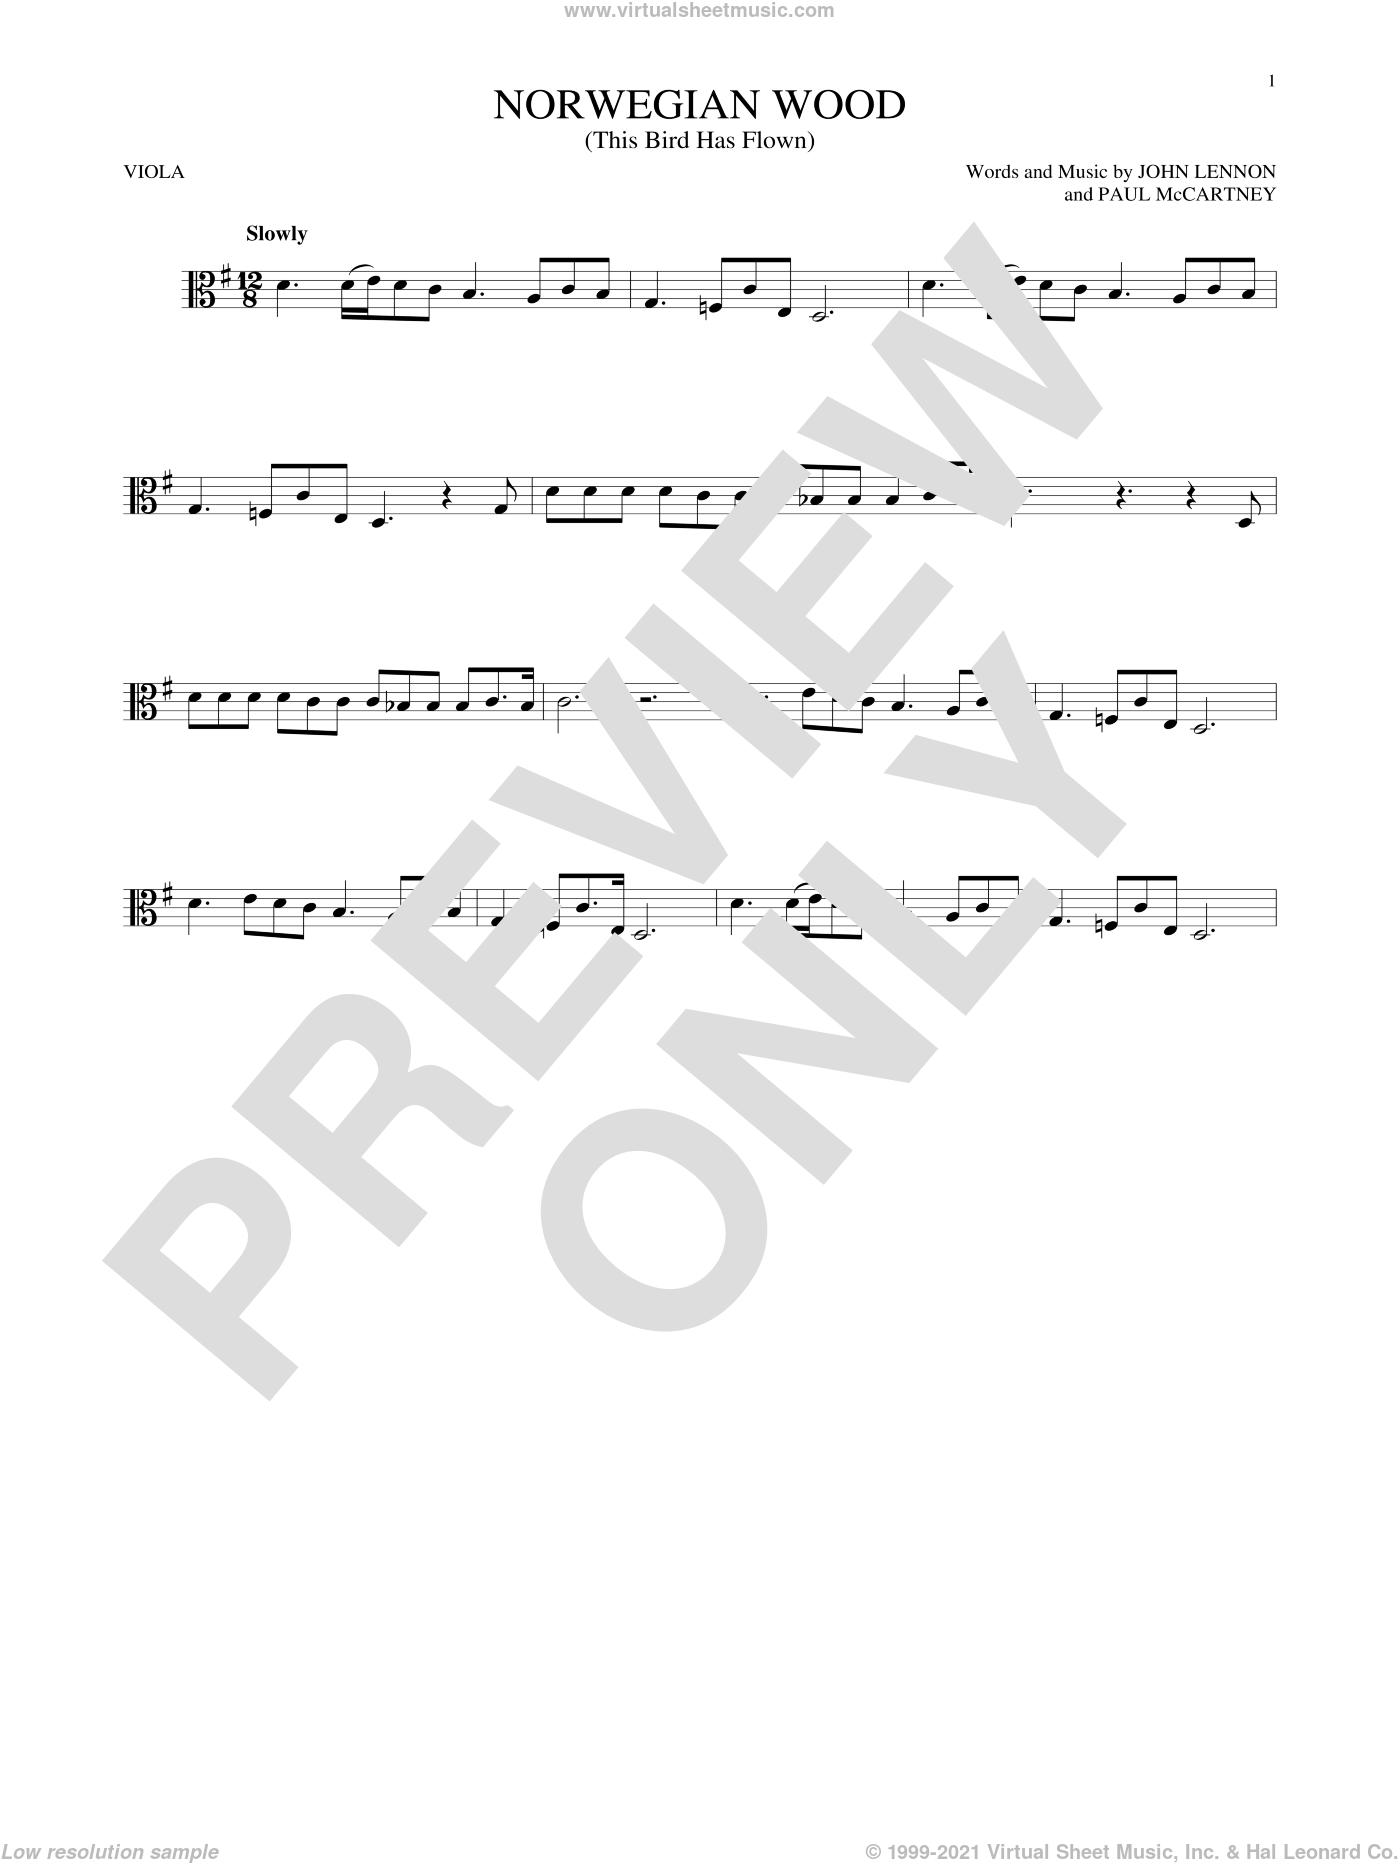 Norwegian Wood (This Bird Has Flown) sheet music for viola solo by The Beatles, John Lennon and Paul McCartney, intermediate skill level